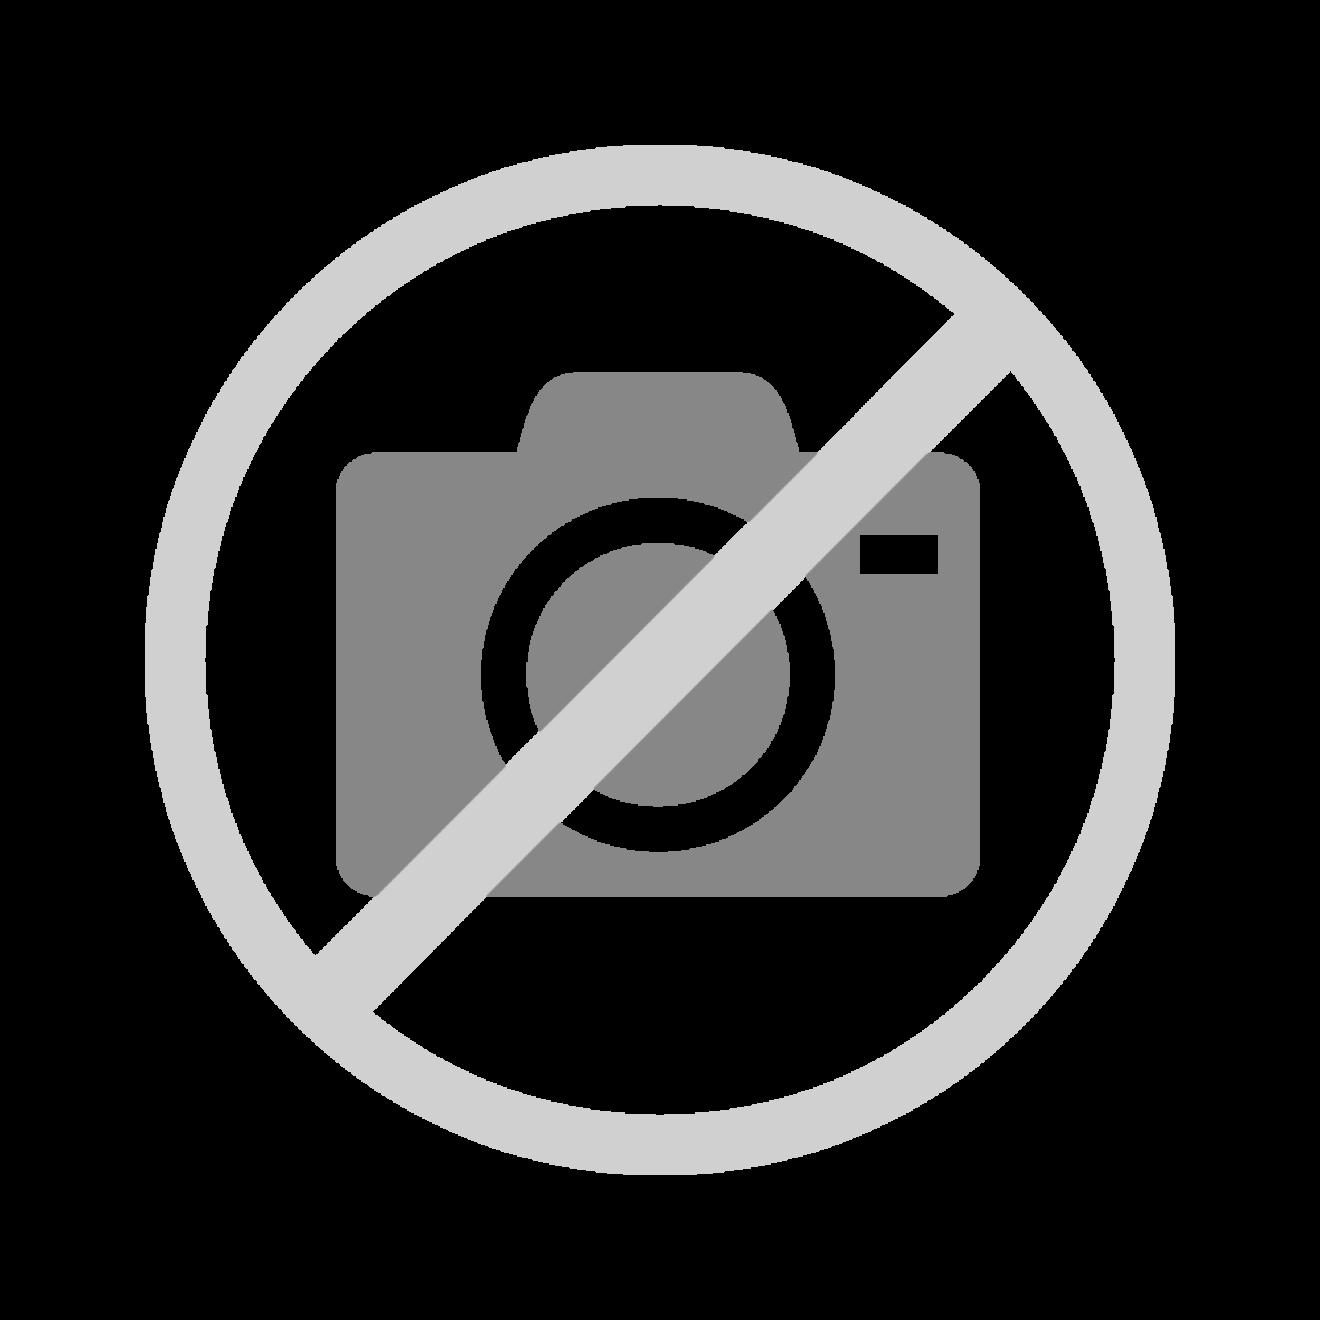 decor walther papierkorb aus holz duschvorhangstangen. Black Bedroom Furniture Sets. Home Design Ideas